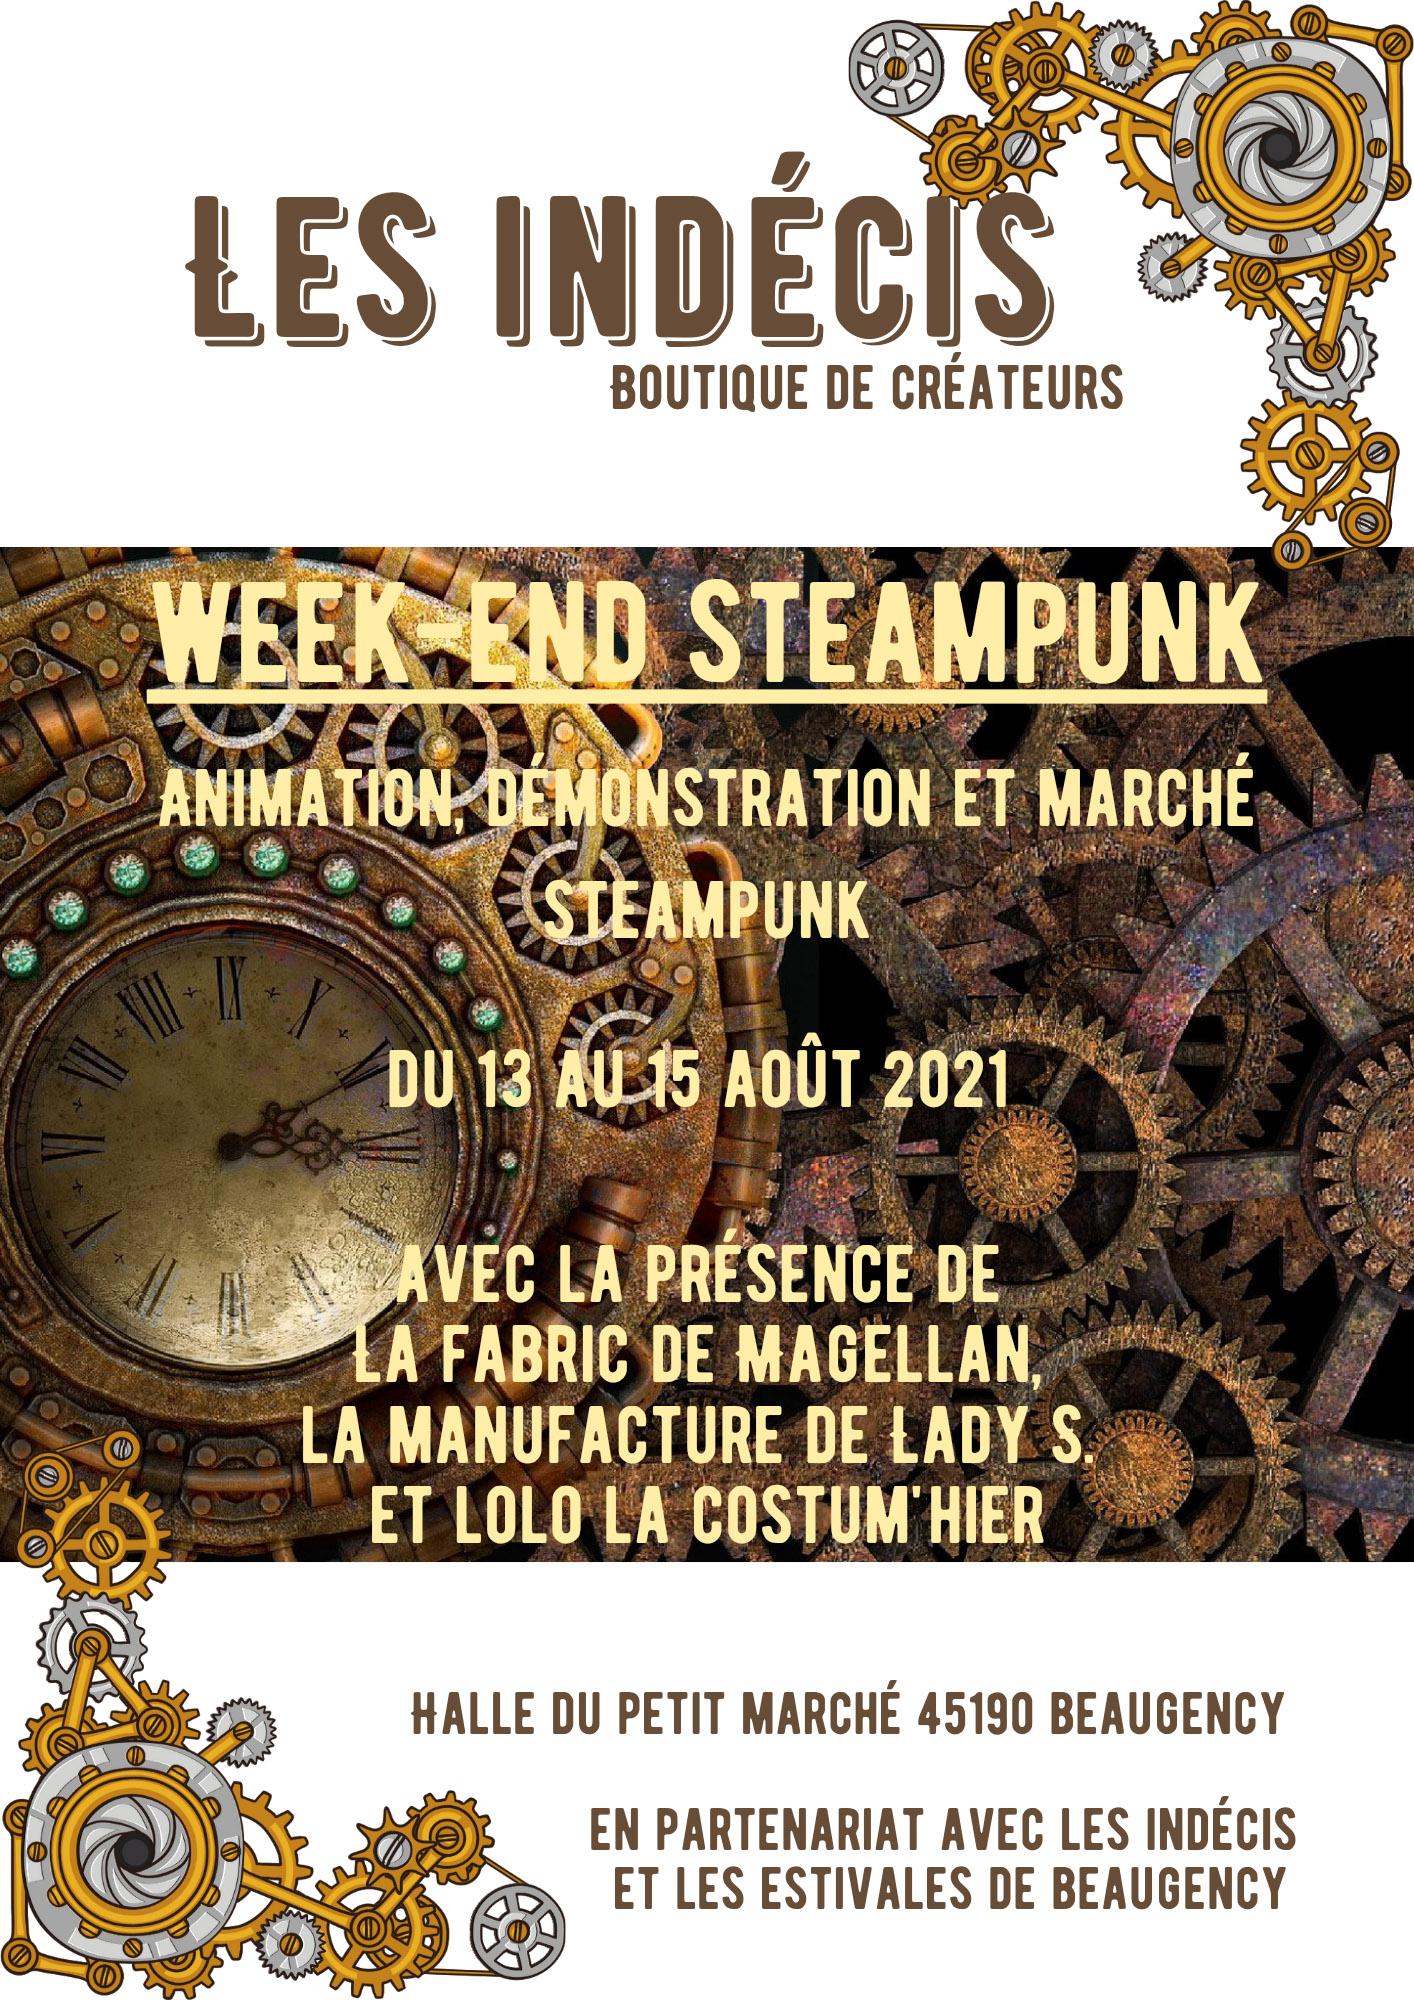 week end Steampunk à Beaugency 13 à 15 aout 2021